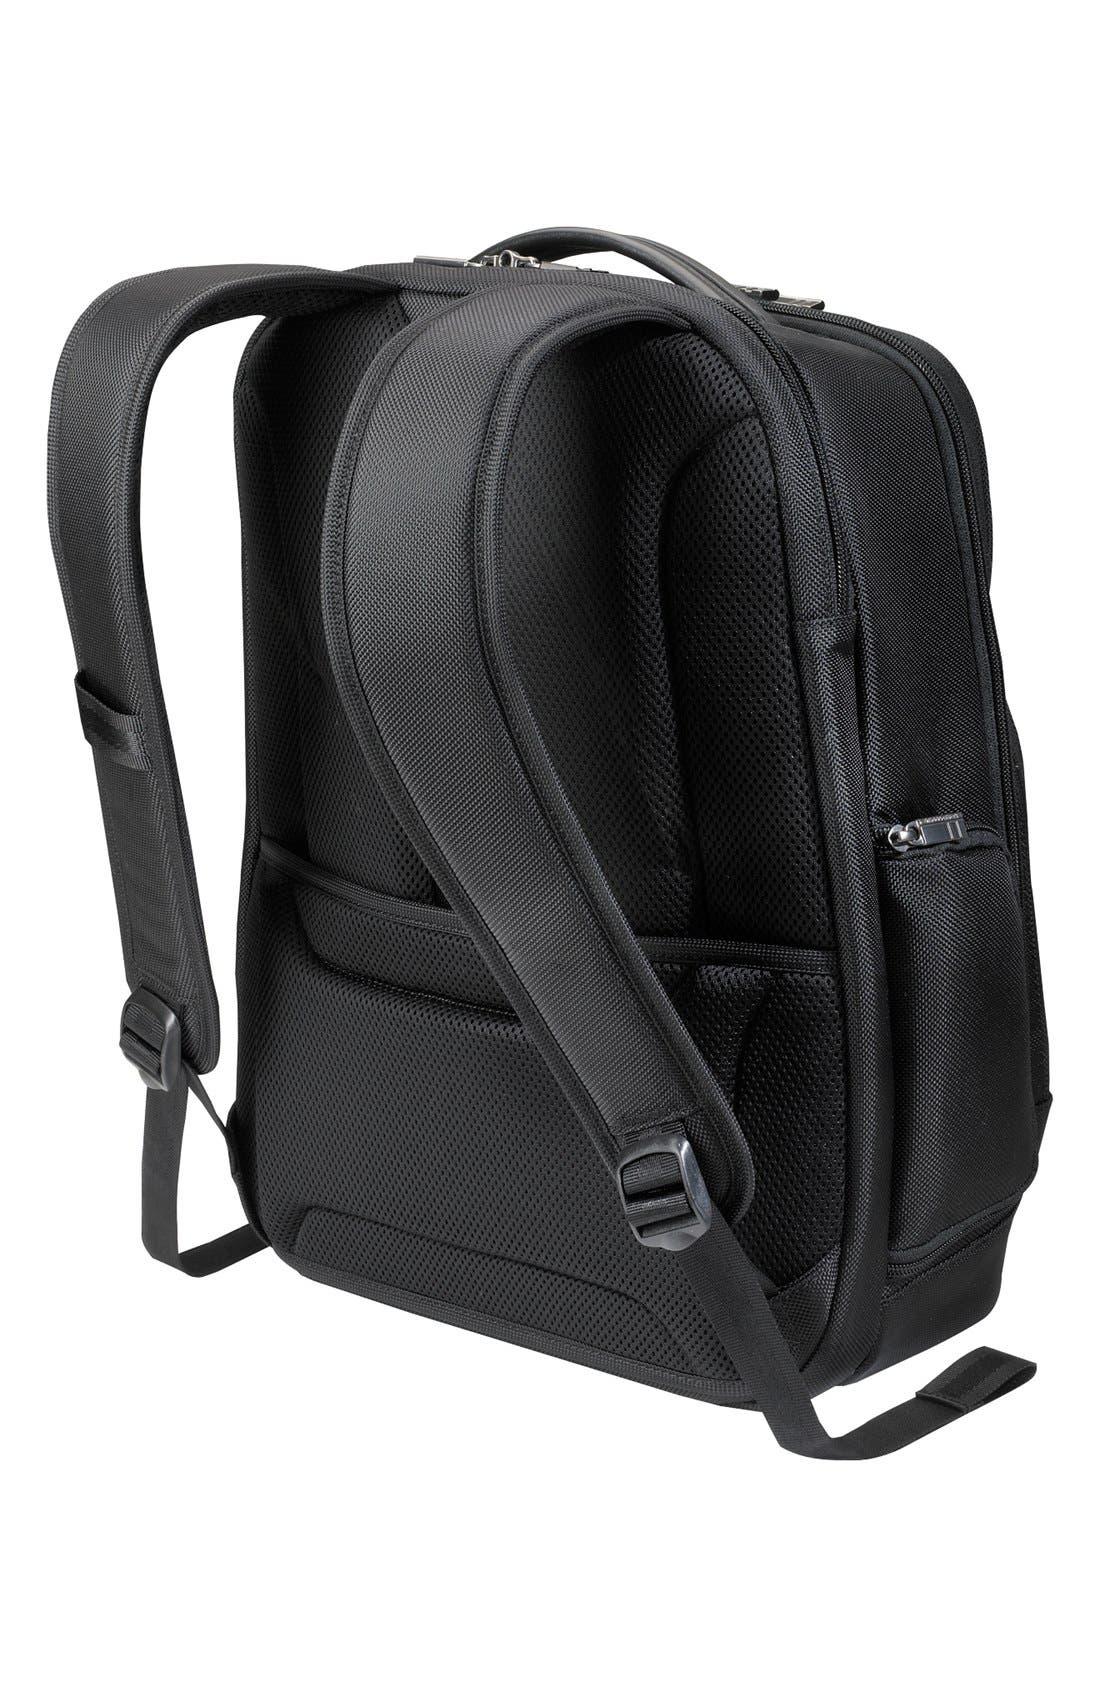 Alternate Image 2  - Briggs & Riley 'Medium' Ballistic Nylon Backpack